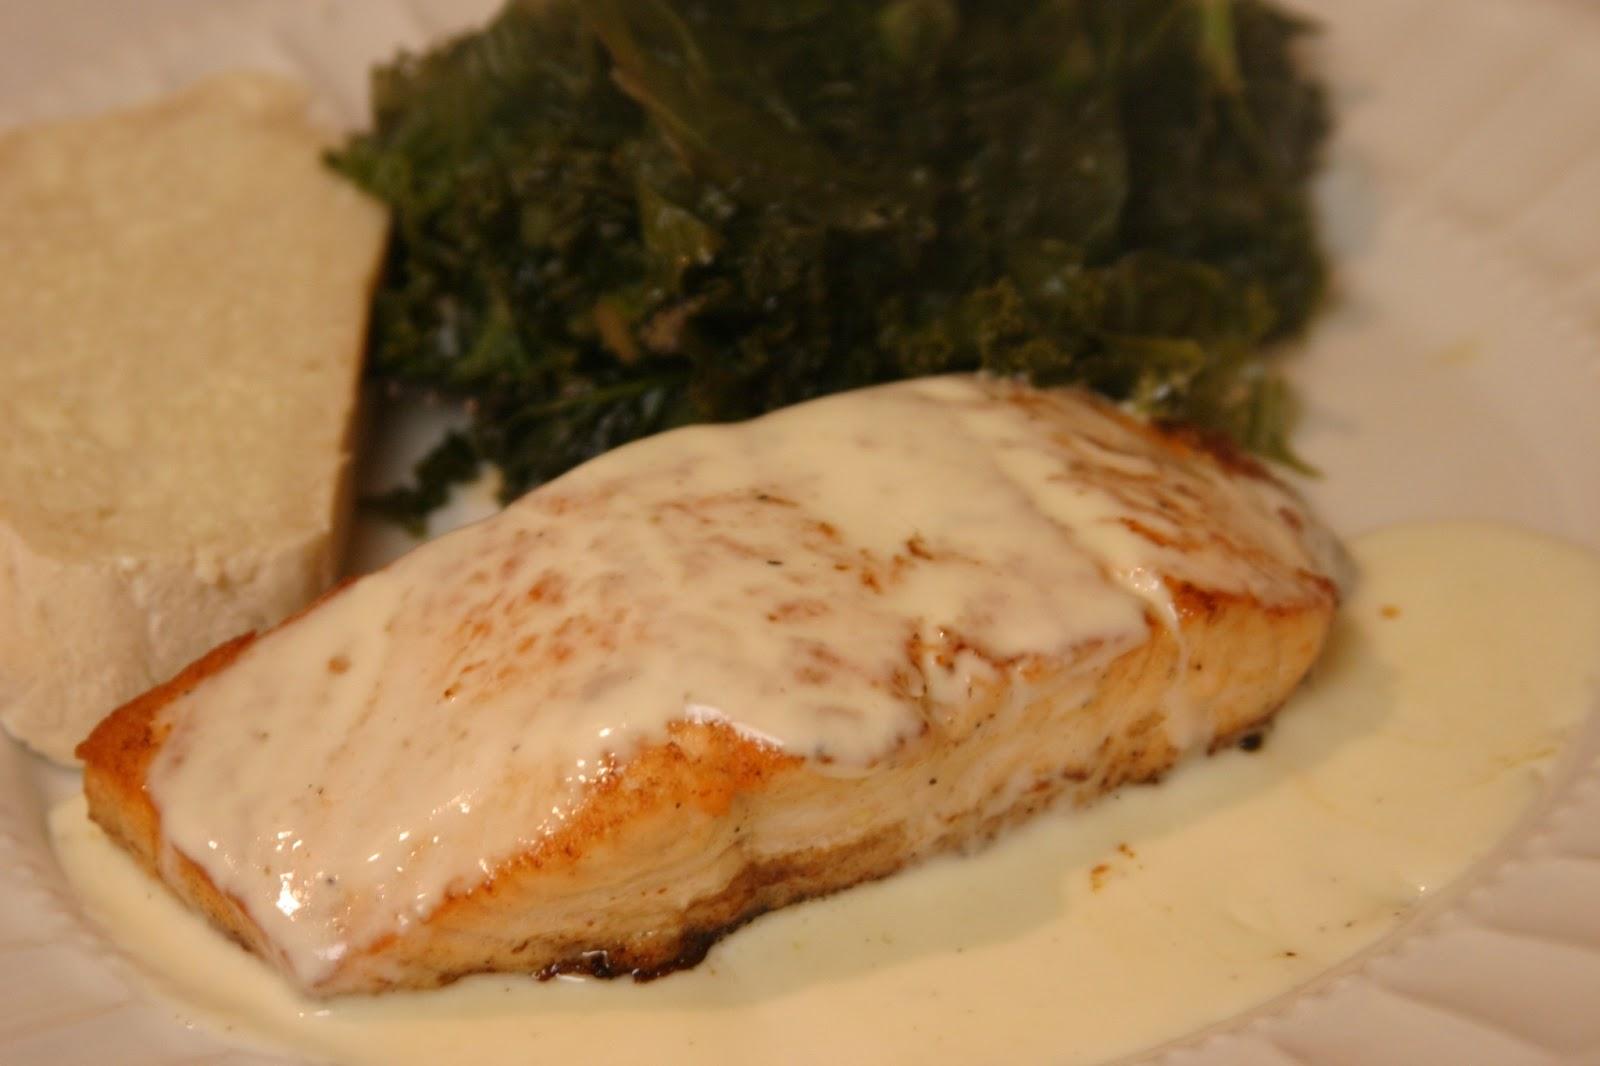 The Joy's of Kitchen Creations: Salmon with Lemon Cream Sauce